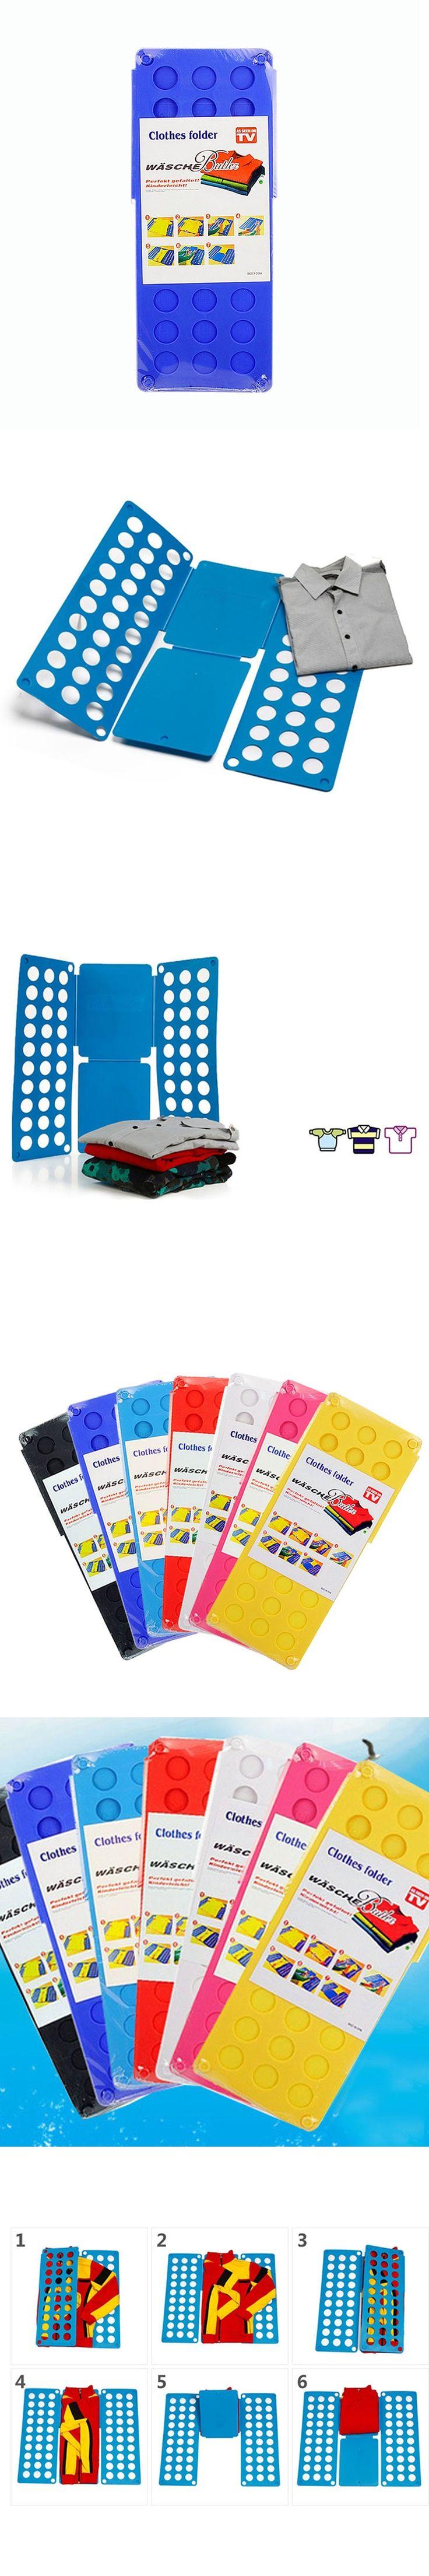 New Miraculous Laundry Folder Children Clothes Folder T-shirts Pants Towels Organizer Fold Garment Bboard Fast Easy Fun Tool BS